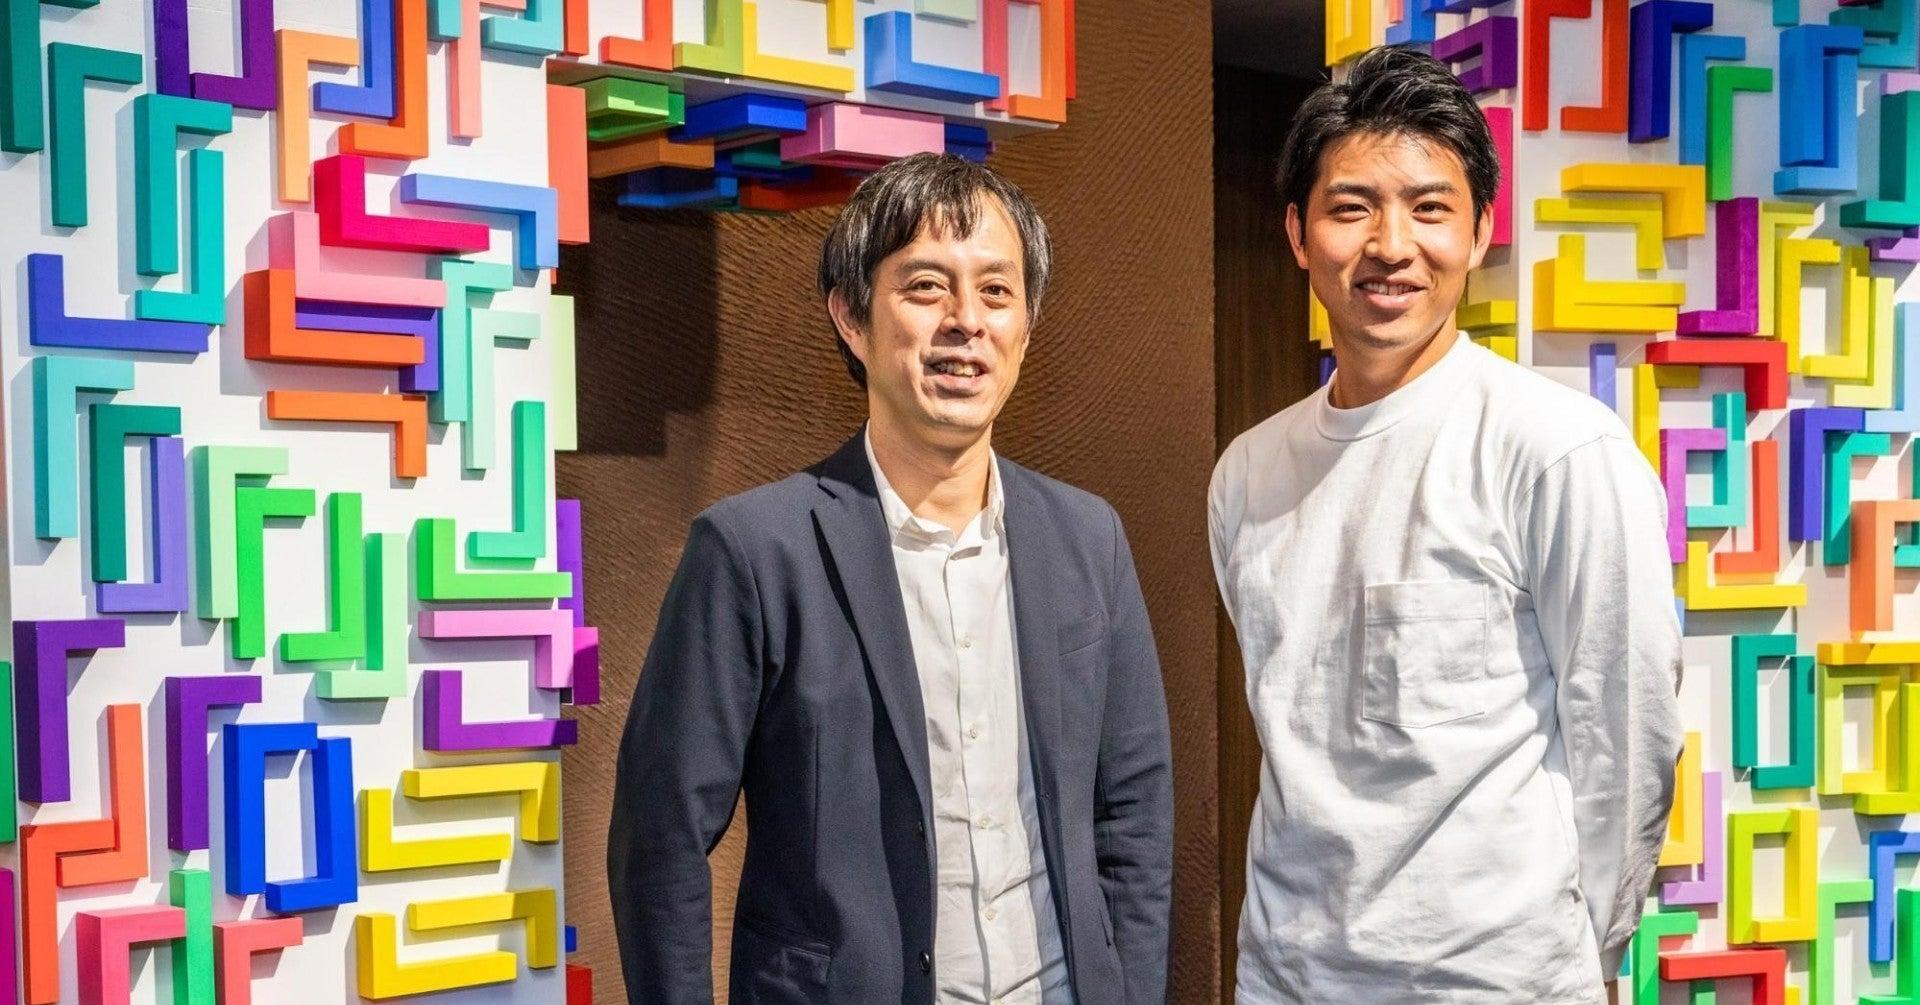 【DXのキーマン直撃】寺田倉庫が実現する「次世代トランクルーム」の形